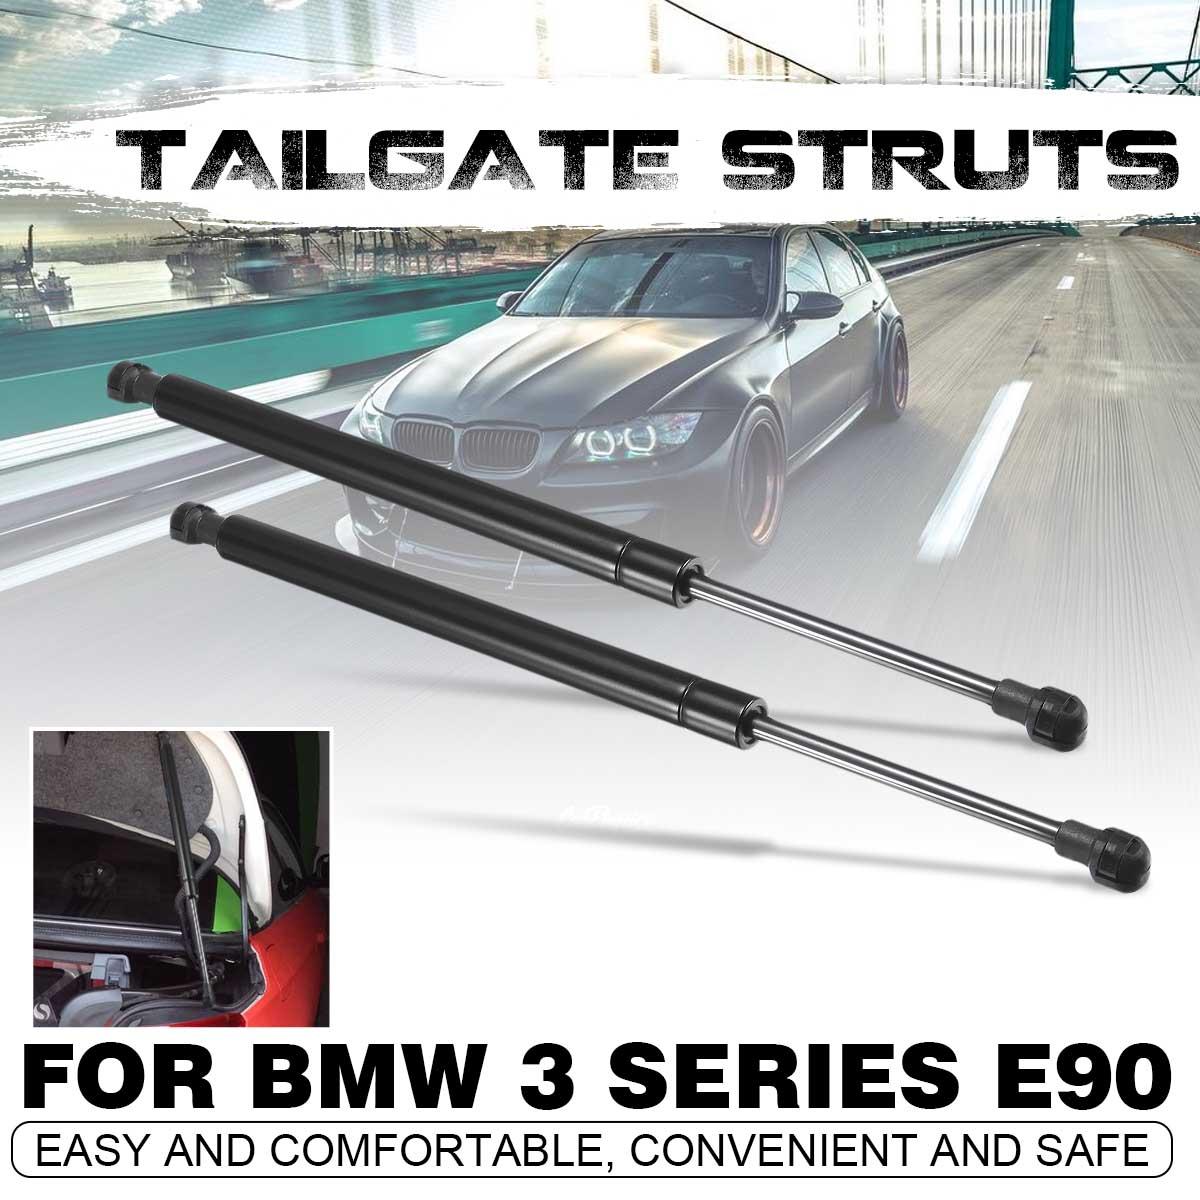 1 Pair 38.5cm Tailgate Boot Trunk Gas Spring Hood Lift Shock Struts For BMW 3 Series E901 Pair 38.5cm Tailgate Boot Trunk Gas Spring Hood Lift Shock Struts For BMW 3 Series E90